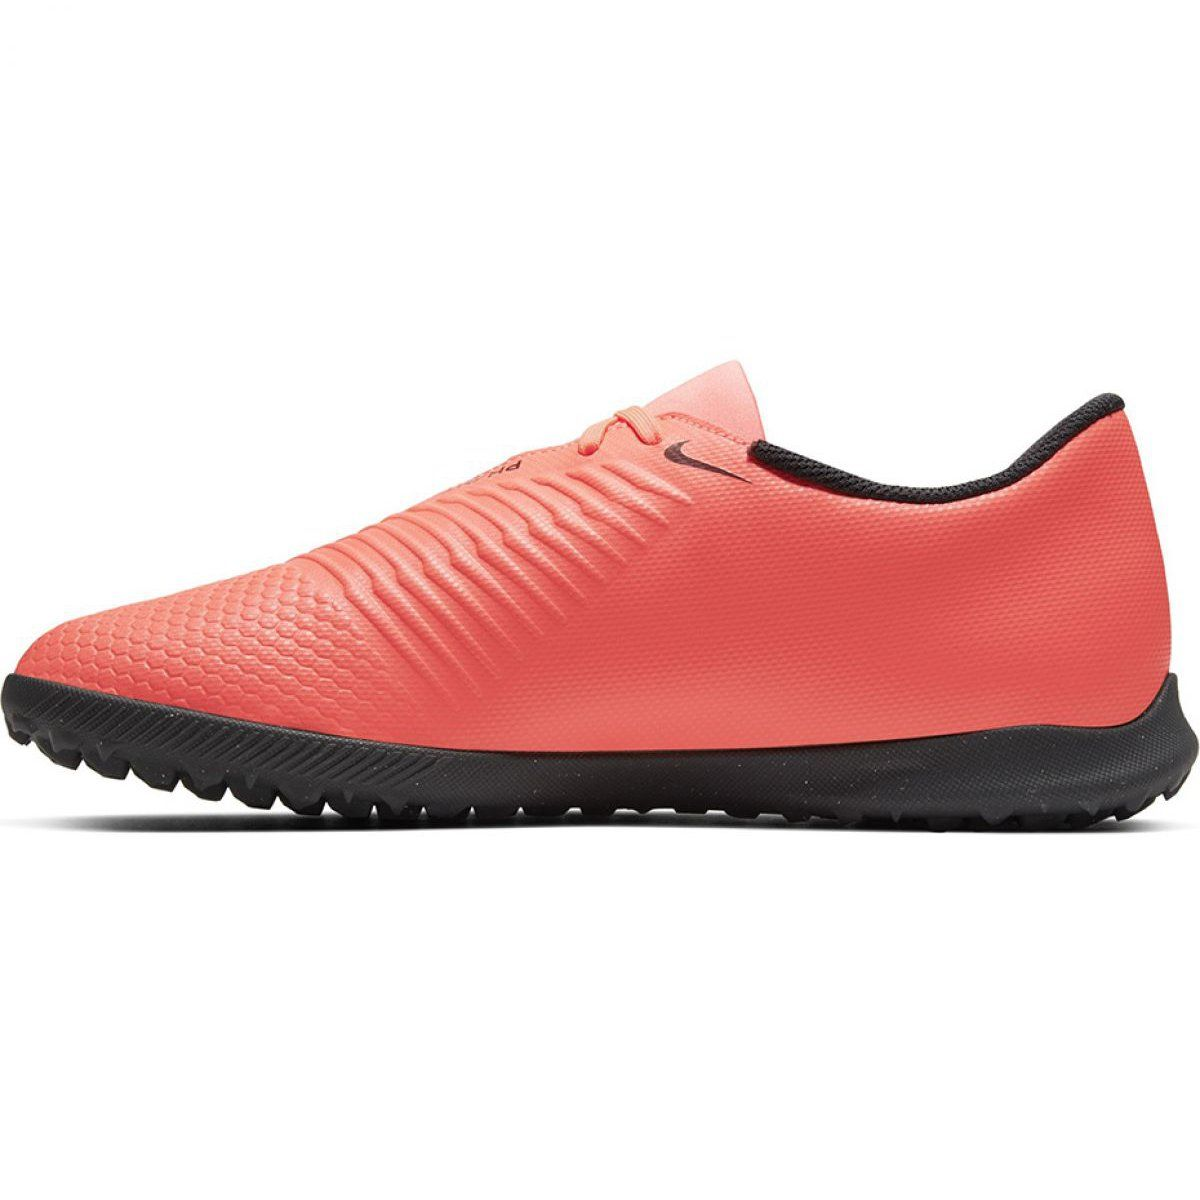 Buty Pilkarskie Nike Hypervenom Phantomx 3 Club Tf Jr Aj3790 600 Wielokolorowe Czerwone Football Boots Football Shoes Kid Shoes